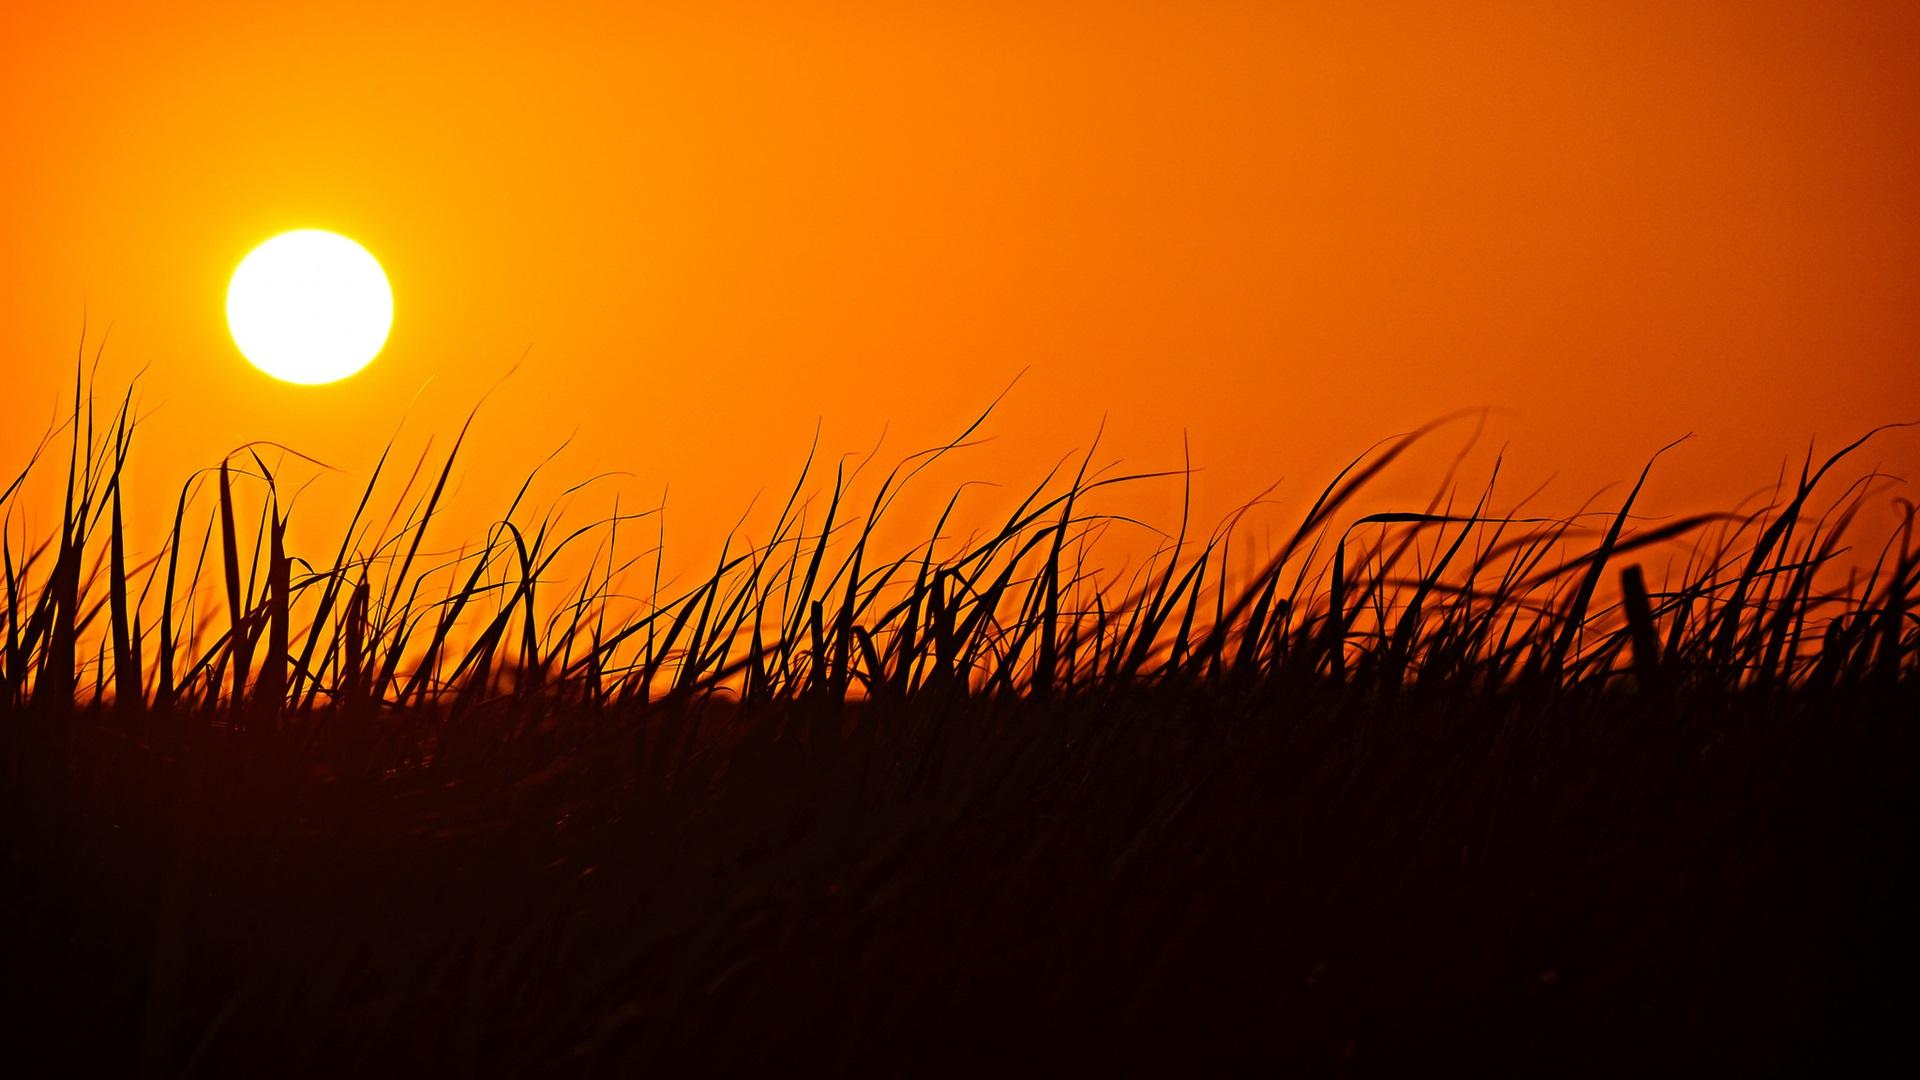 Grass, silhouette, sunset, orange sky Wallpaper ...